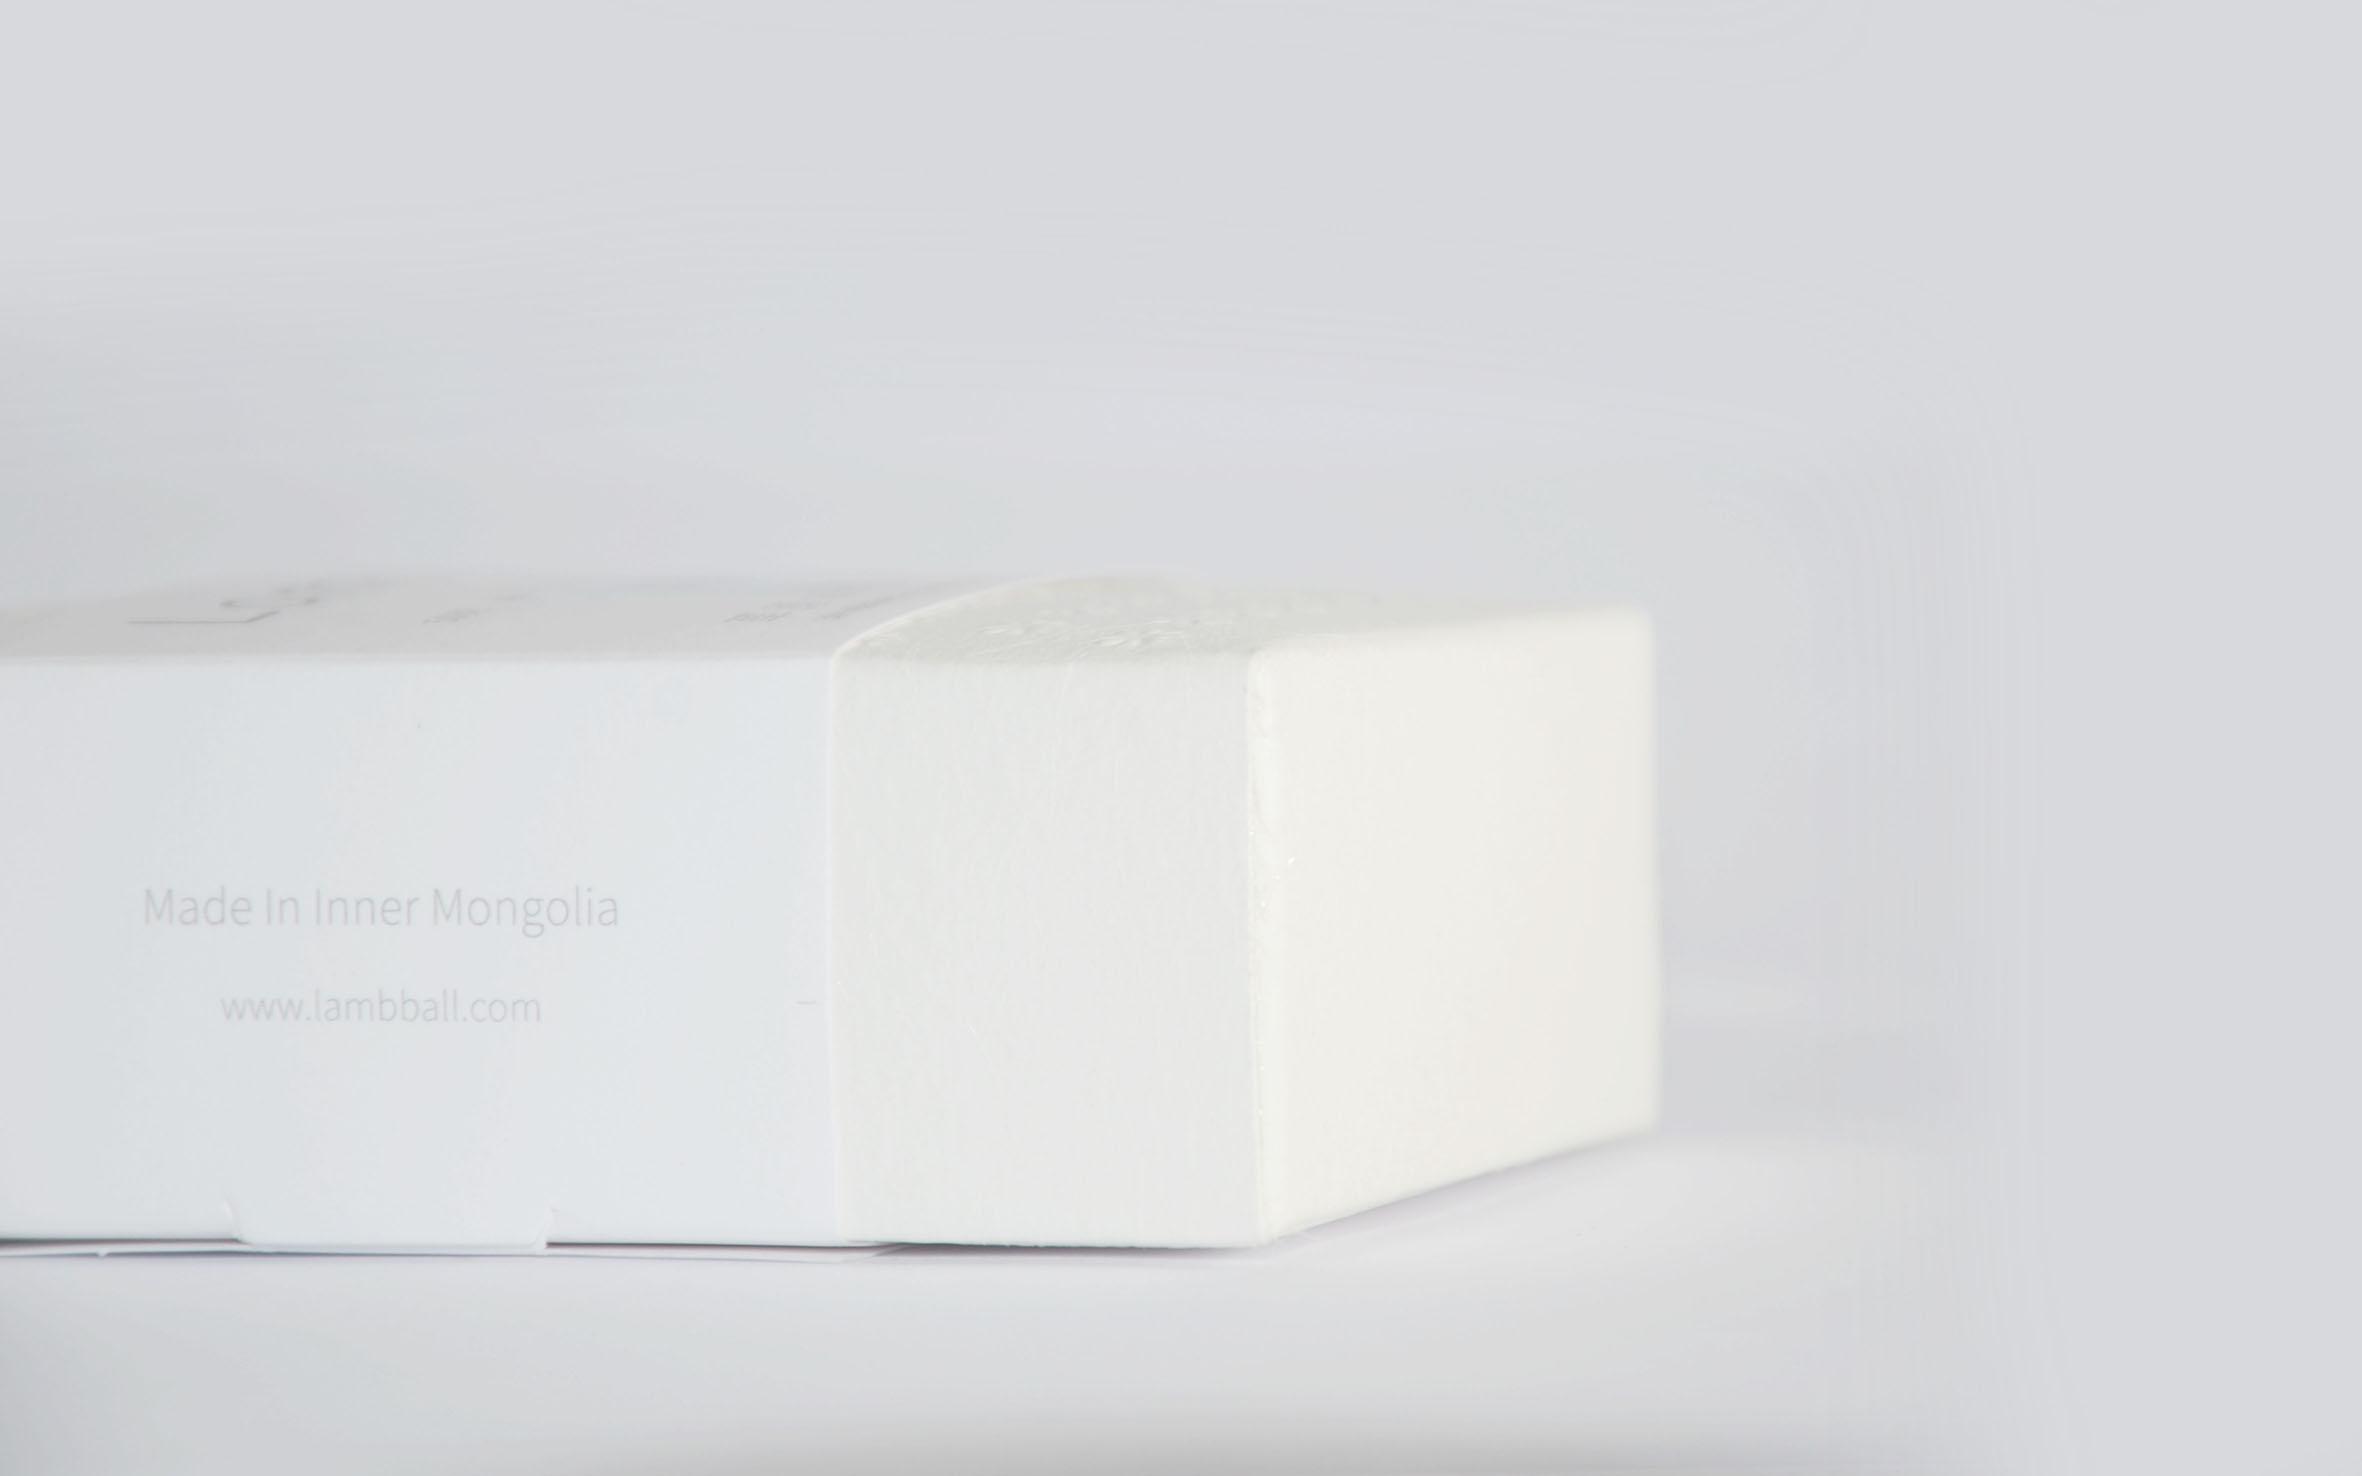 lambball羊奶皂包装设计 第10张 lambball羊奶皂包装设计 蒙古设计